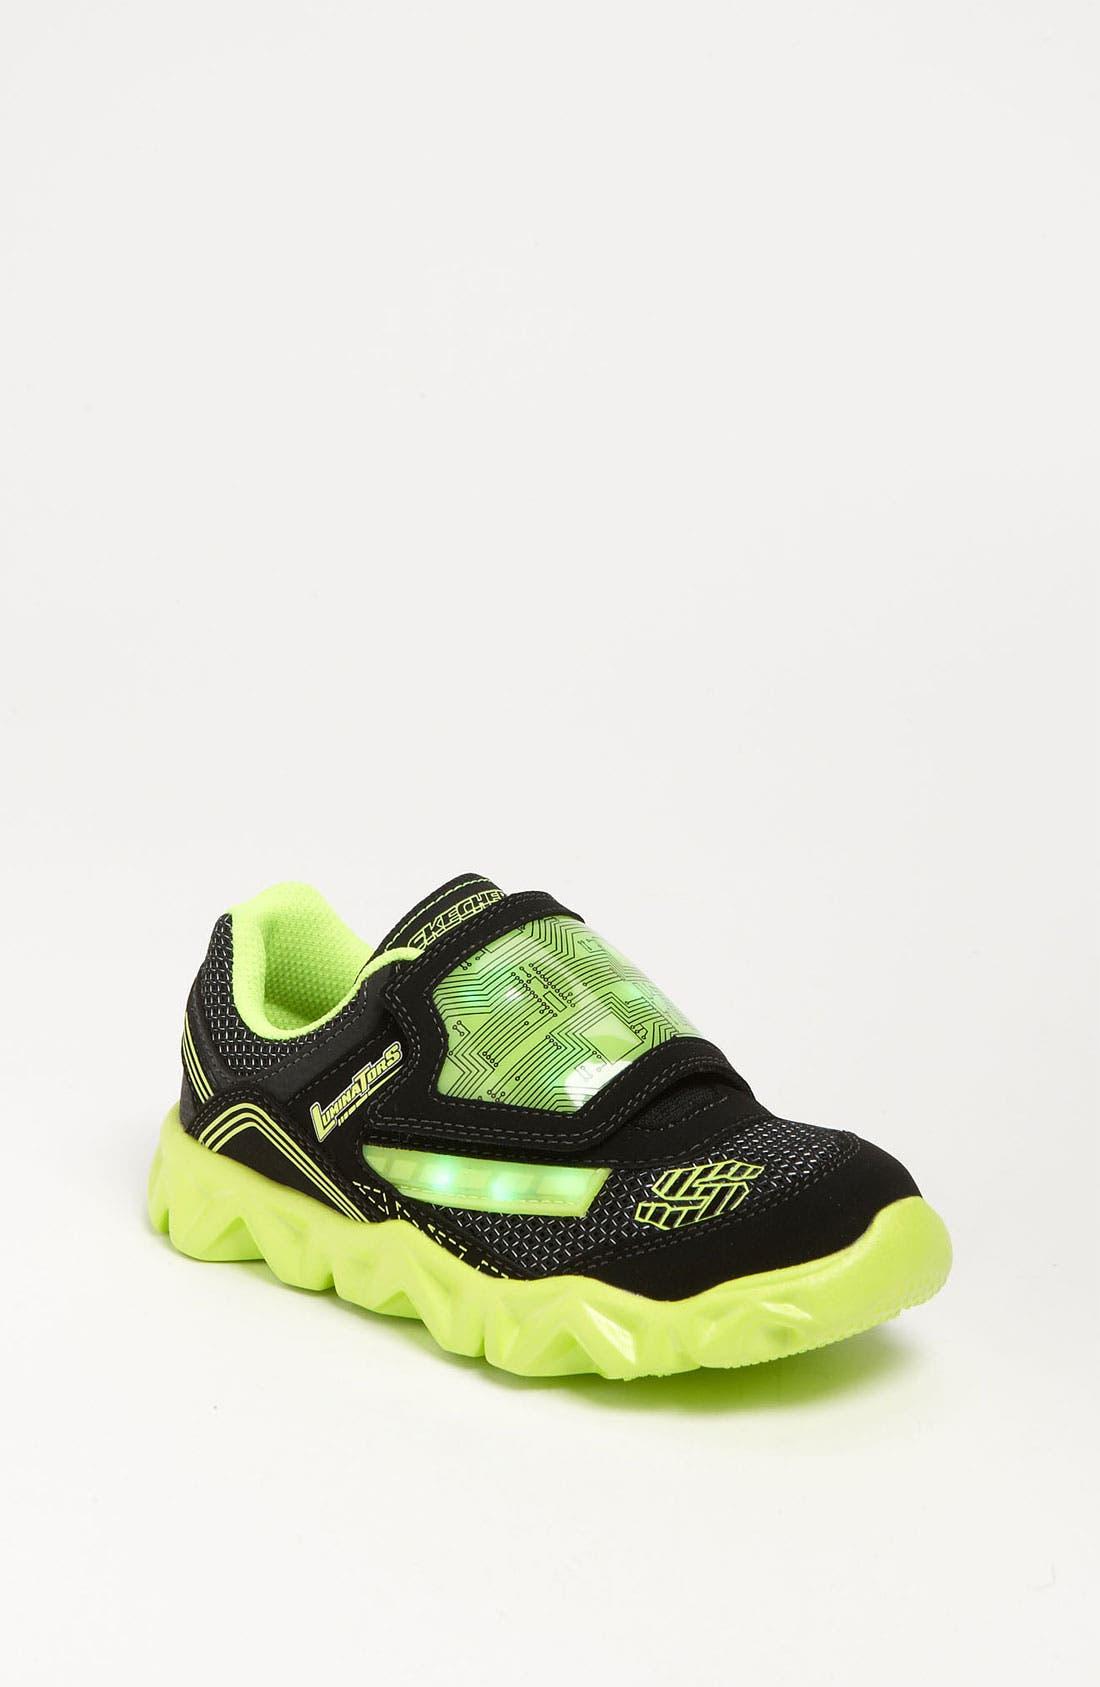 Main Image - SKECHERS 'S Lights - Datarox' Light-Up Sneaker (Toddler & Little Kid)